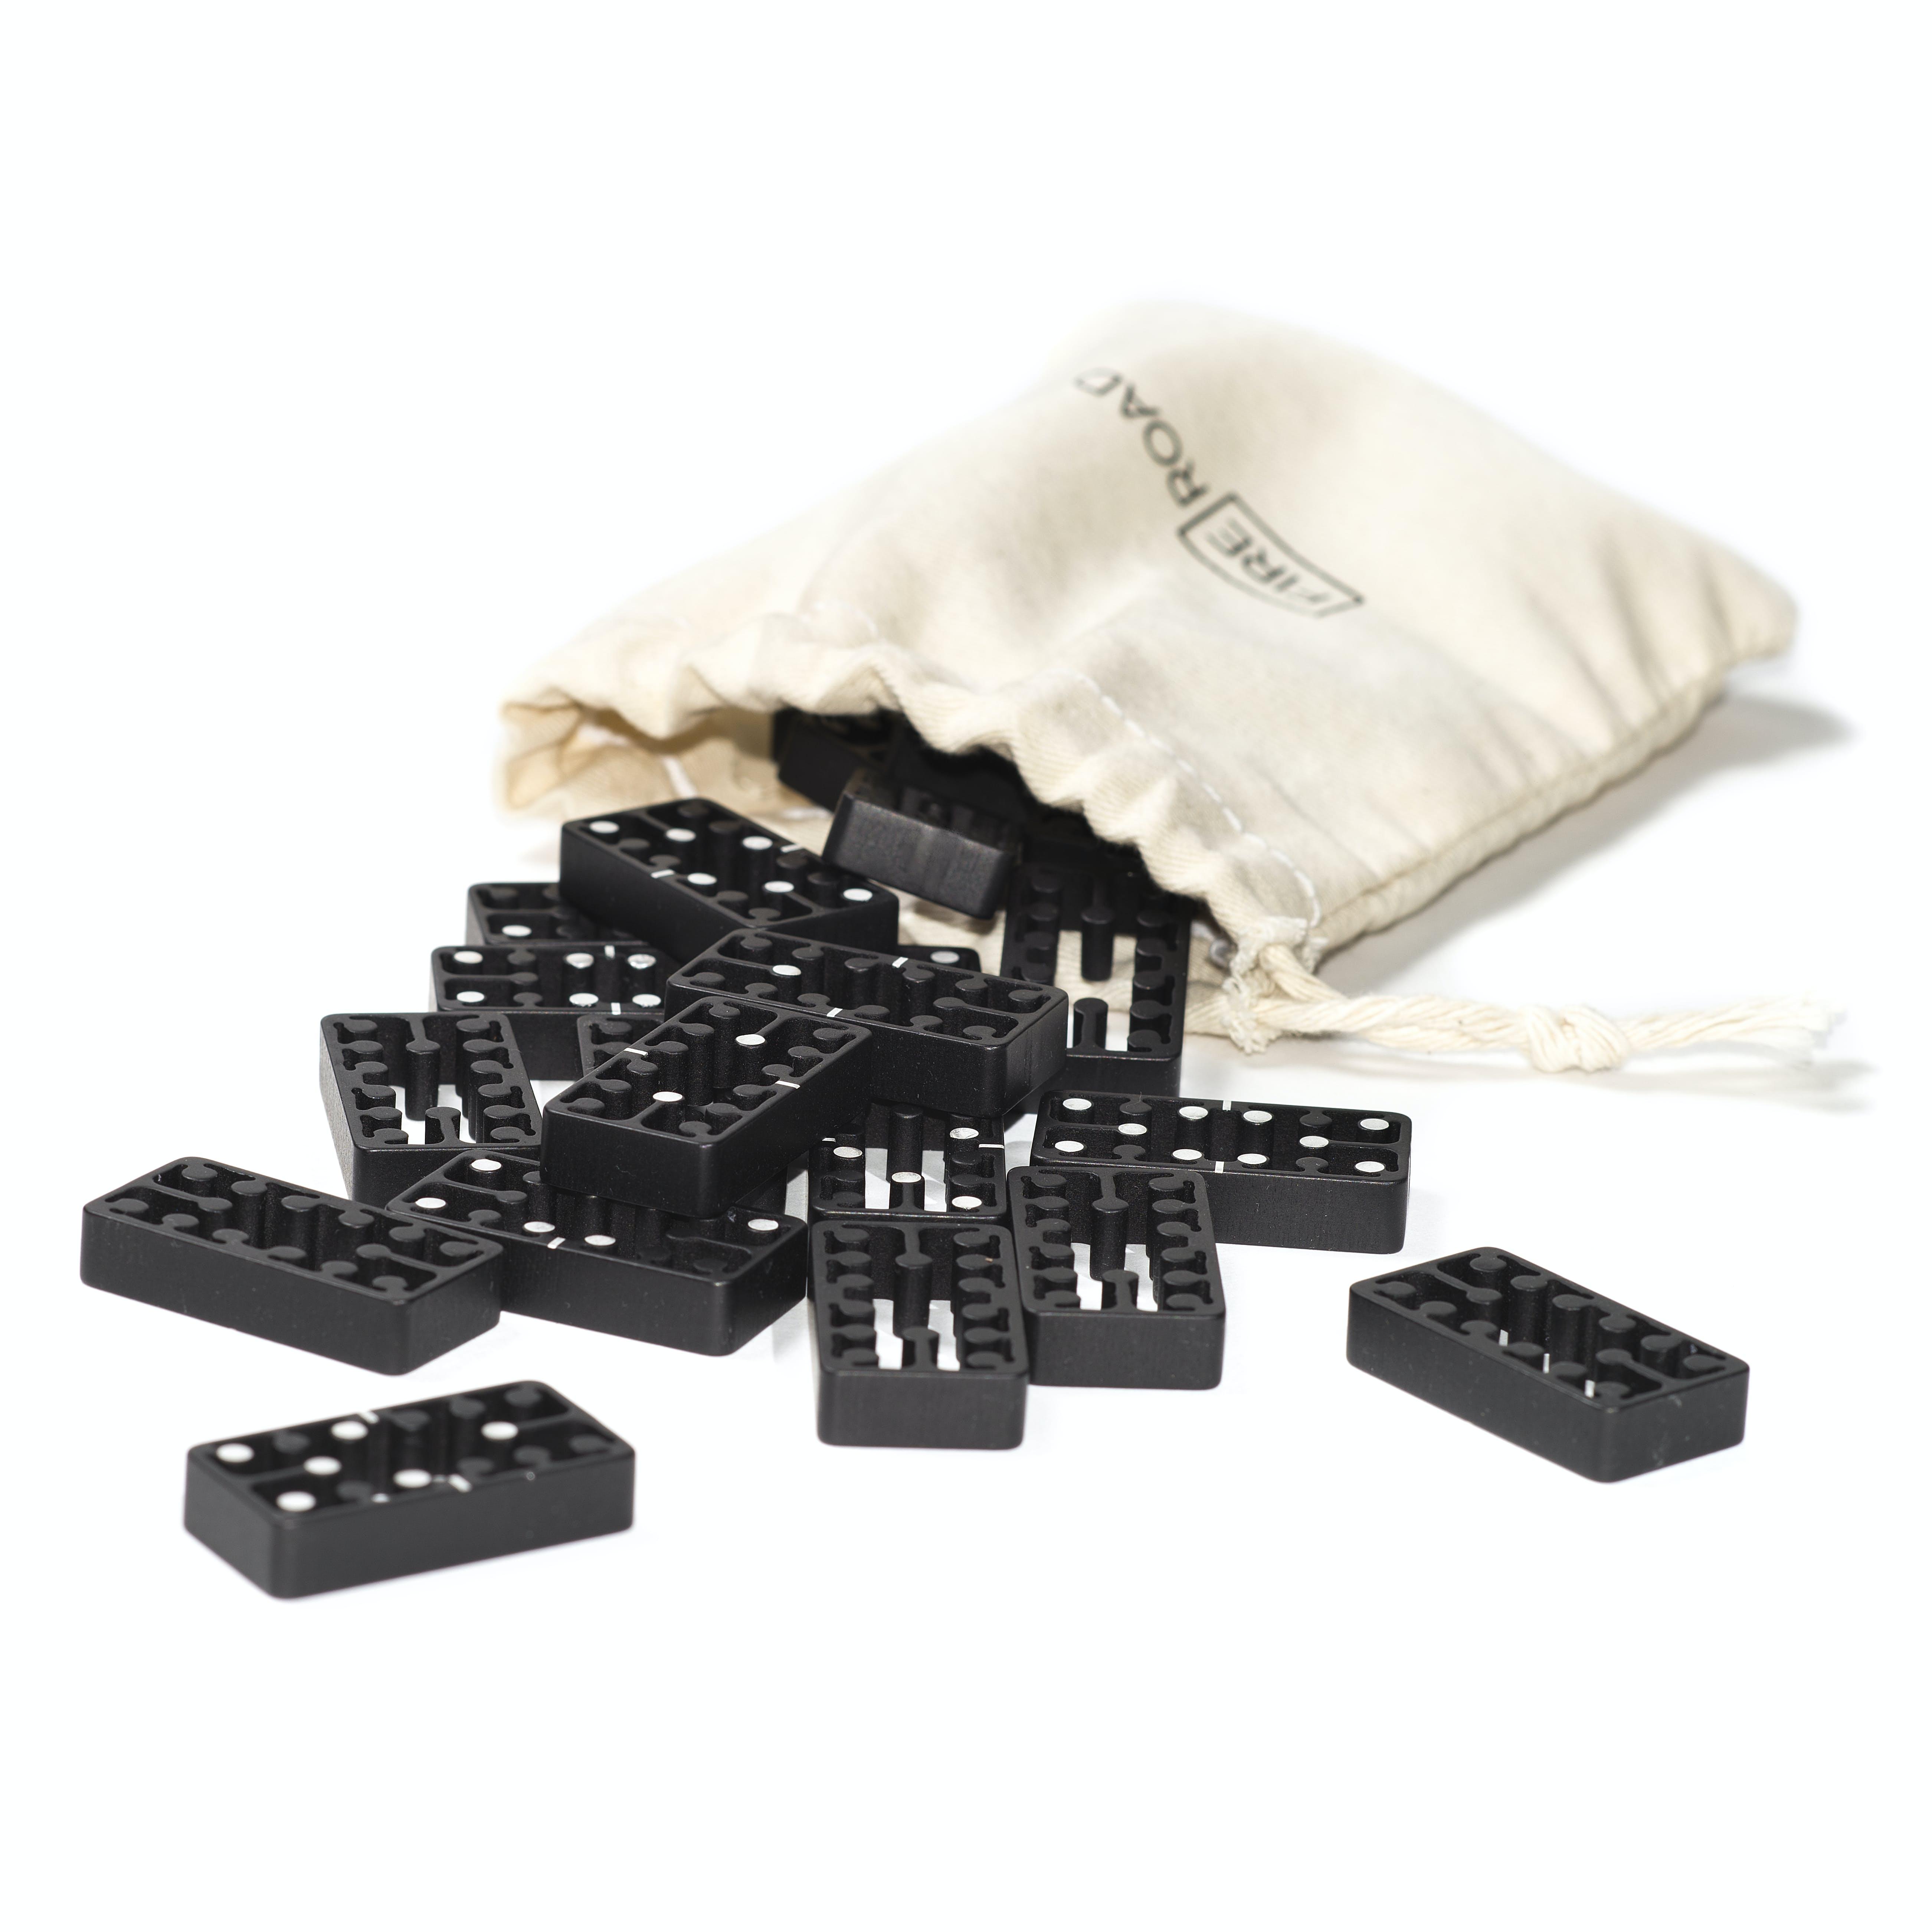 Iefk4crzmn fire road edge domino set and cotton bag 0 original